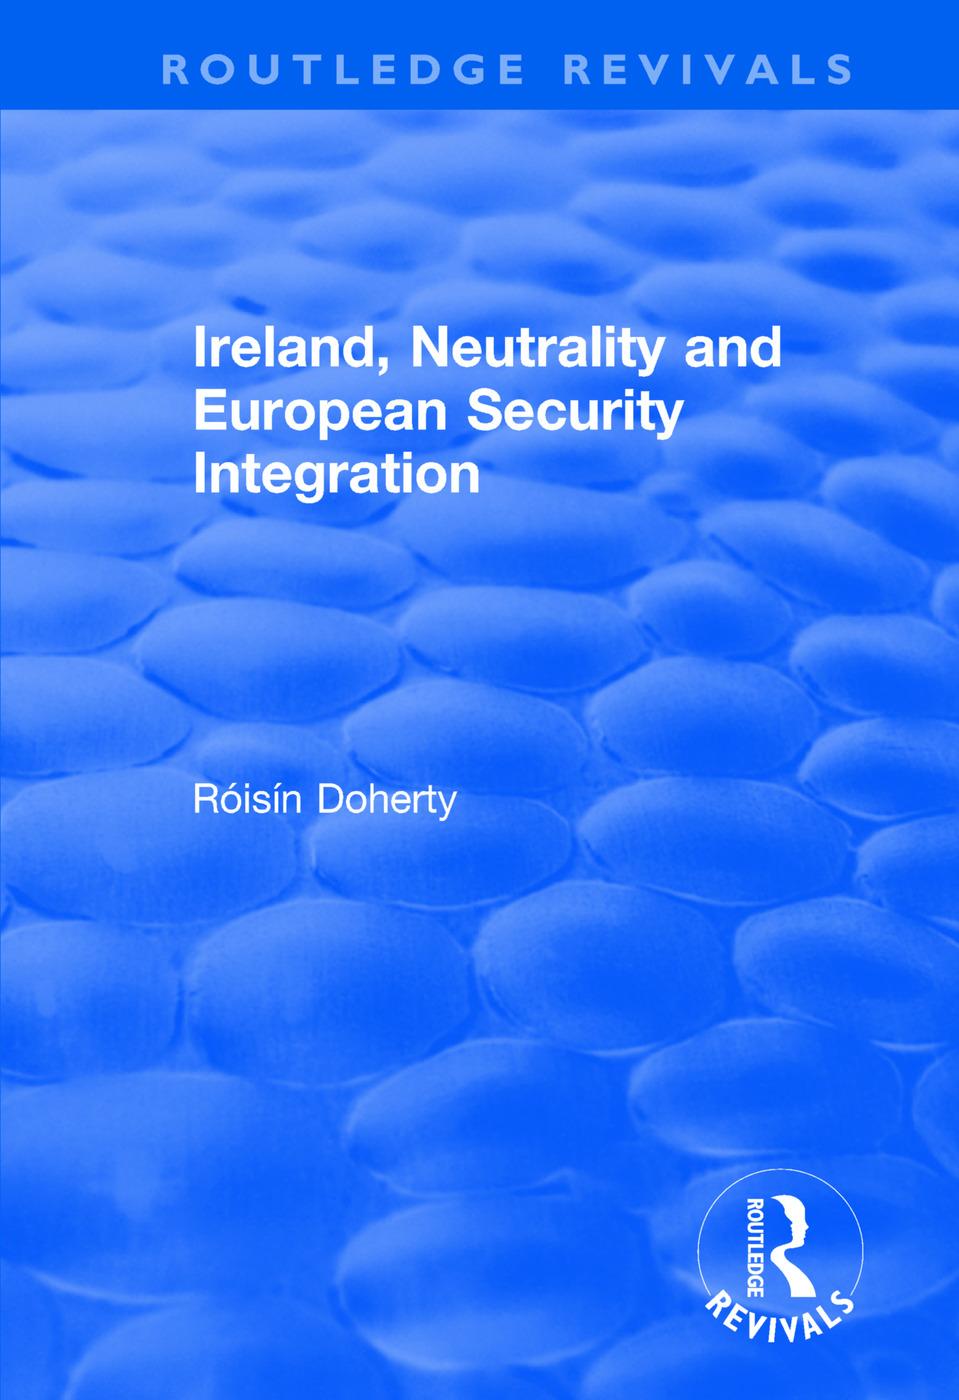 Ireland, Neutrality and European Security Integration